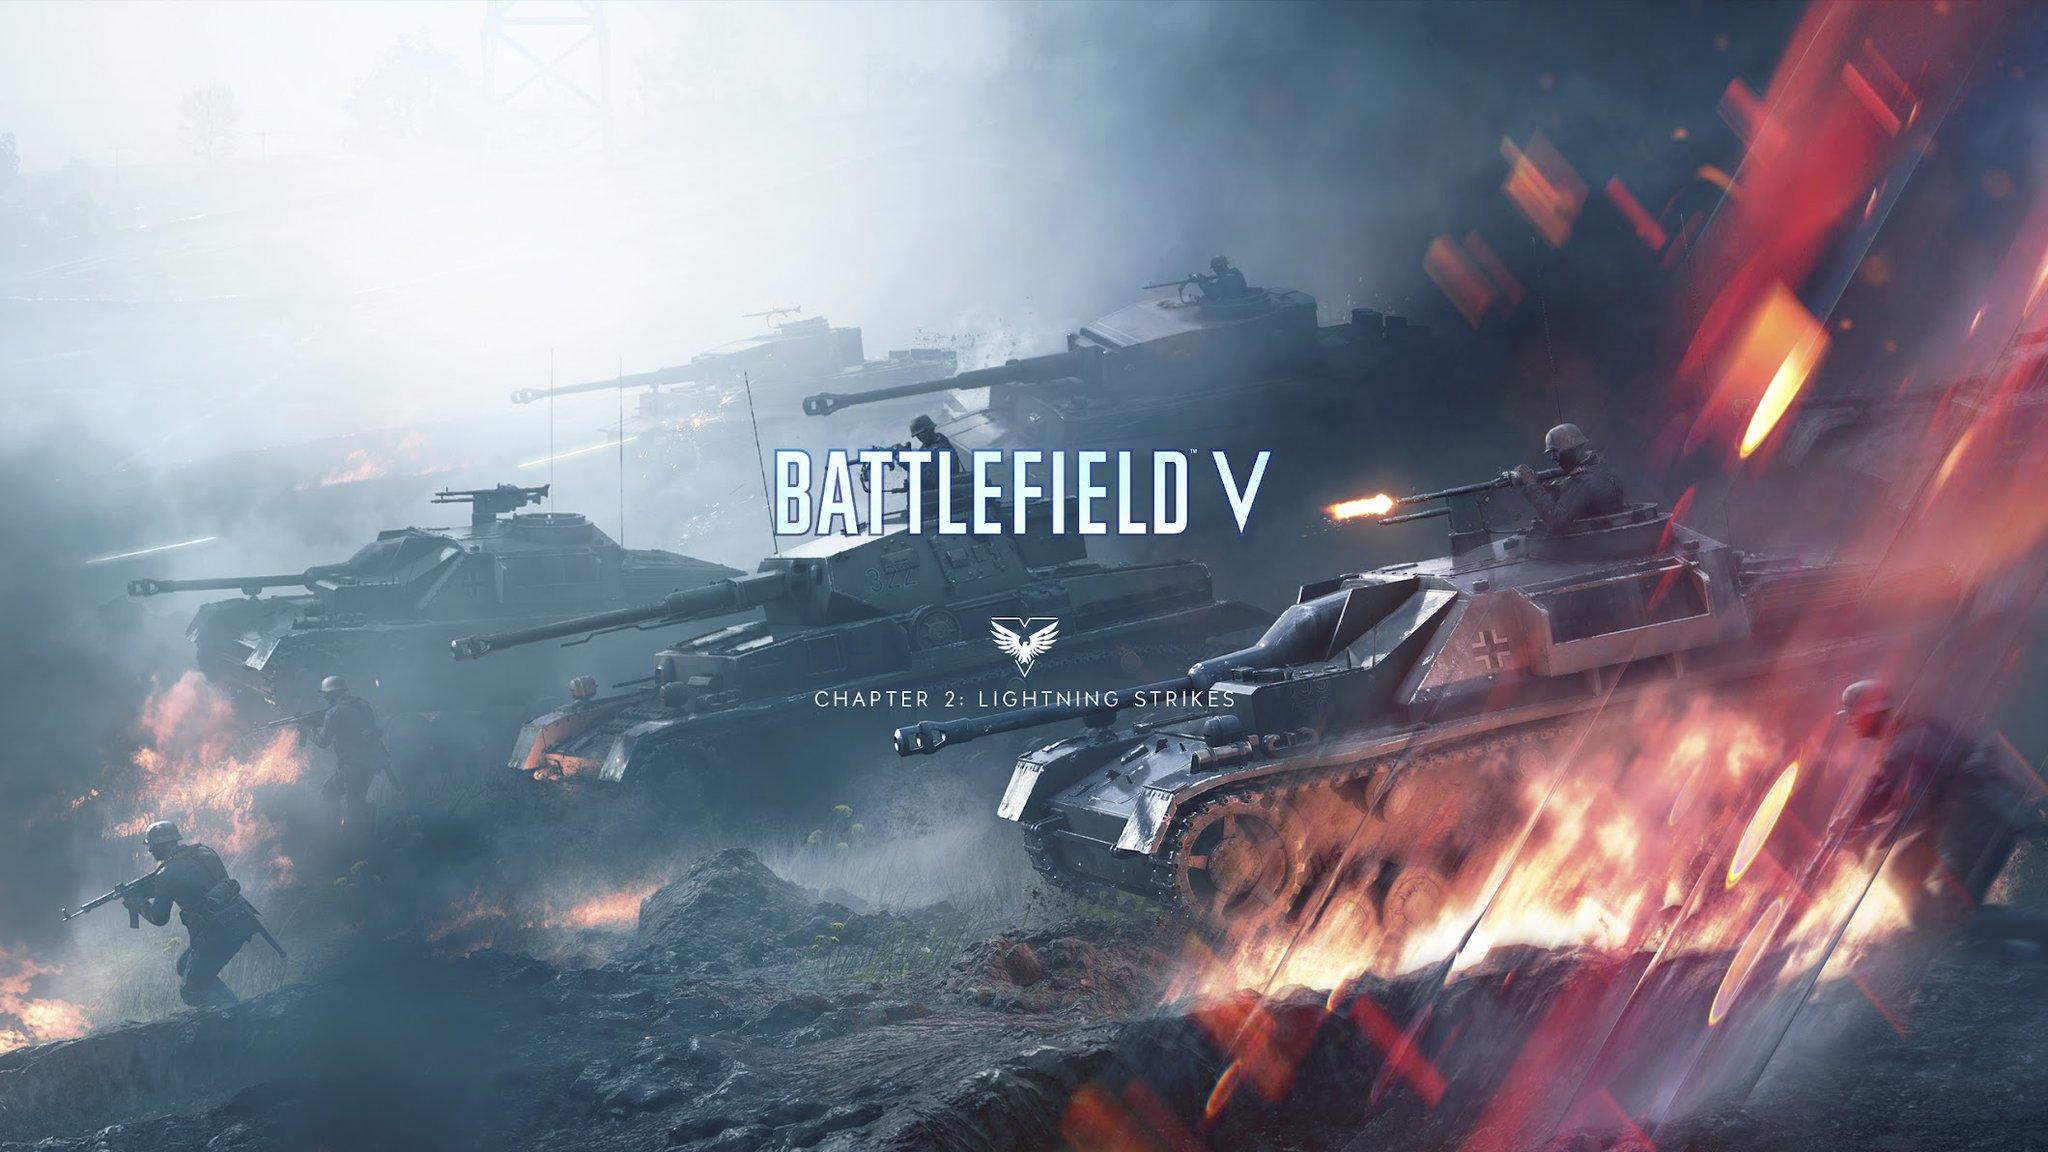 Battlefield V Tides of War Chapter 2 Lighting Strikes (1)